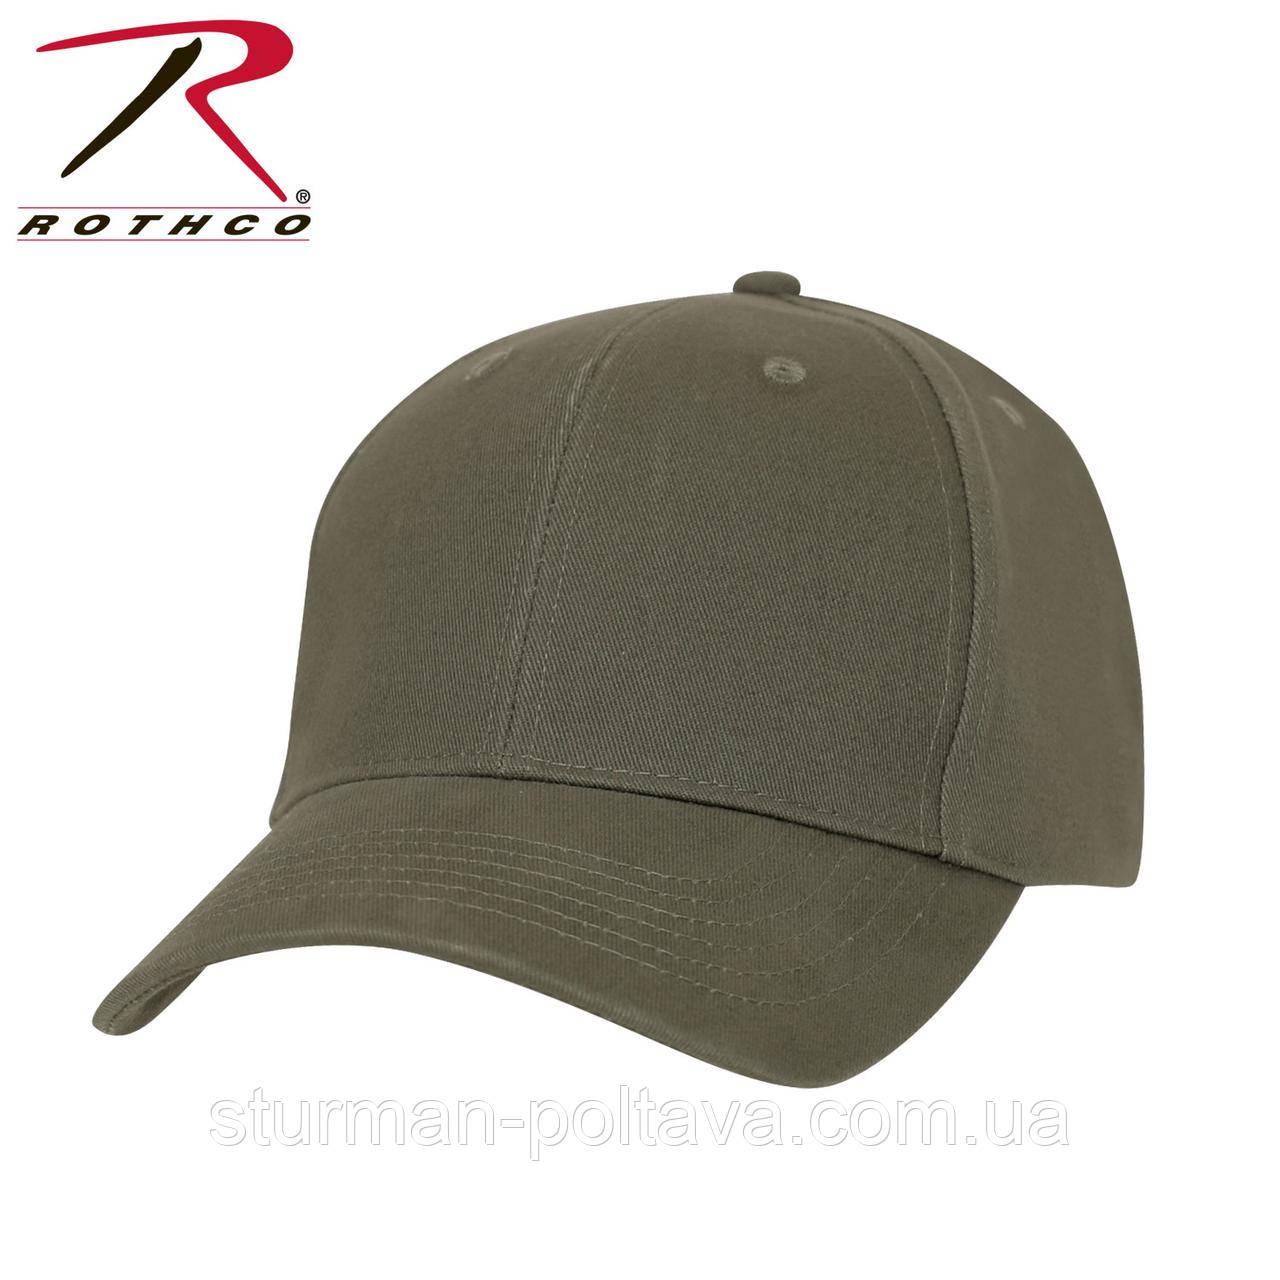 Бейсболка чоловіча олива SOLID OLIVE DRAB LOW PROFILE CAP